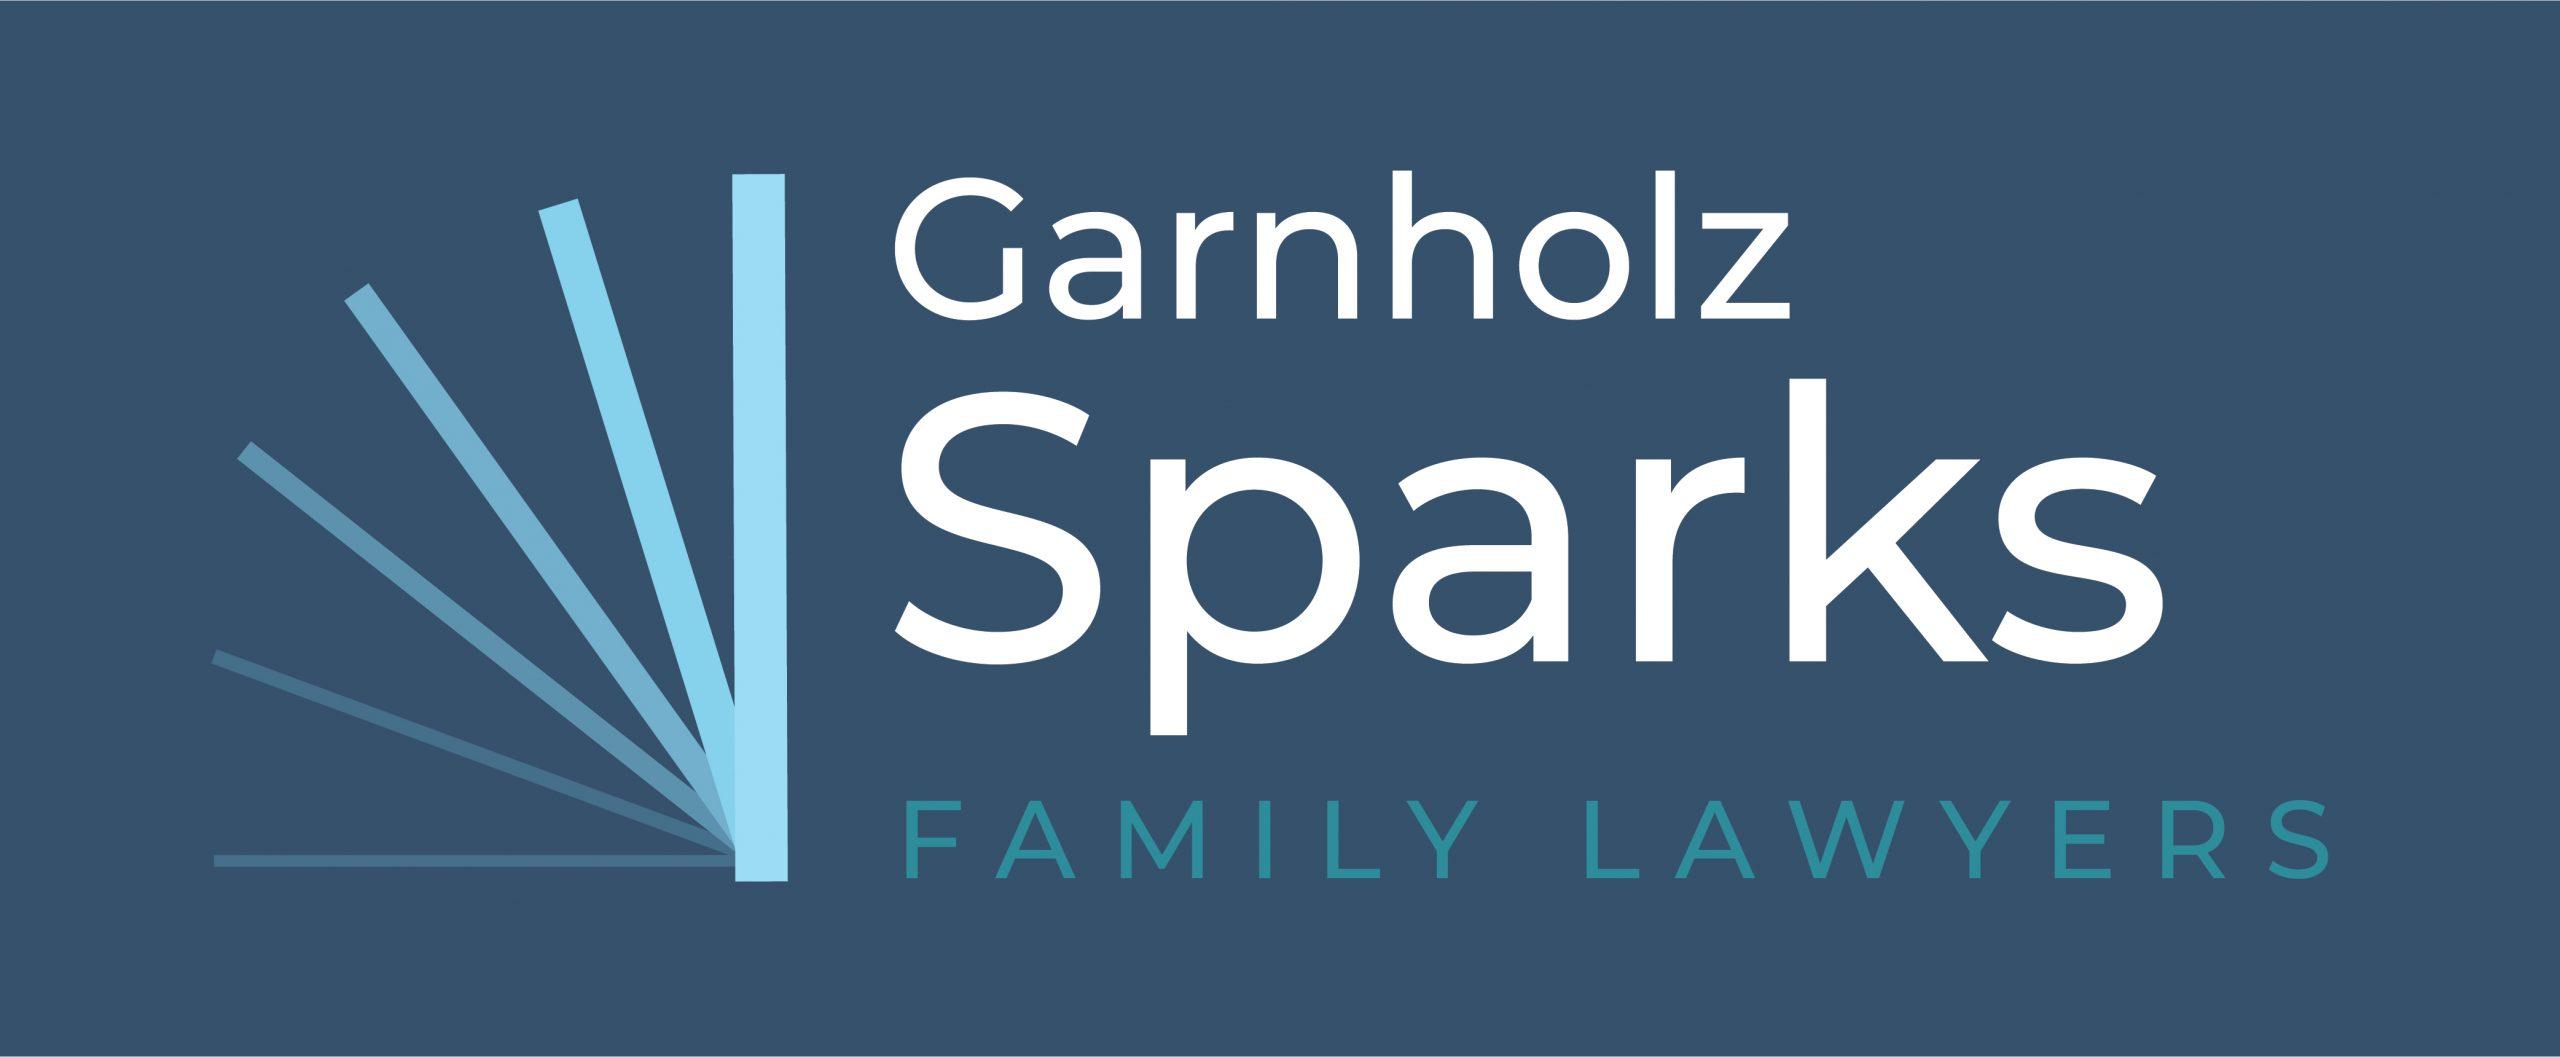 Garnholz Sparks